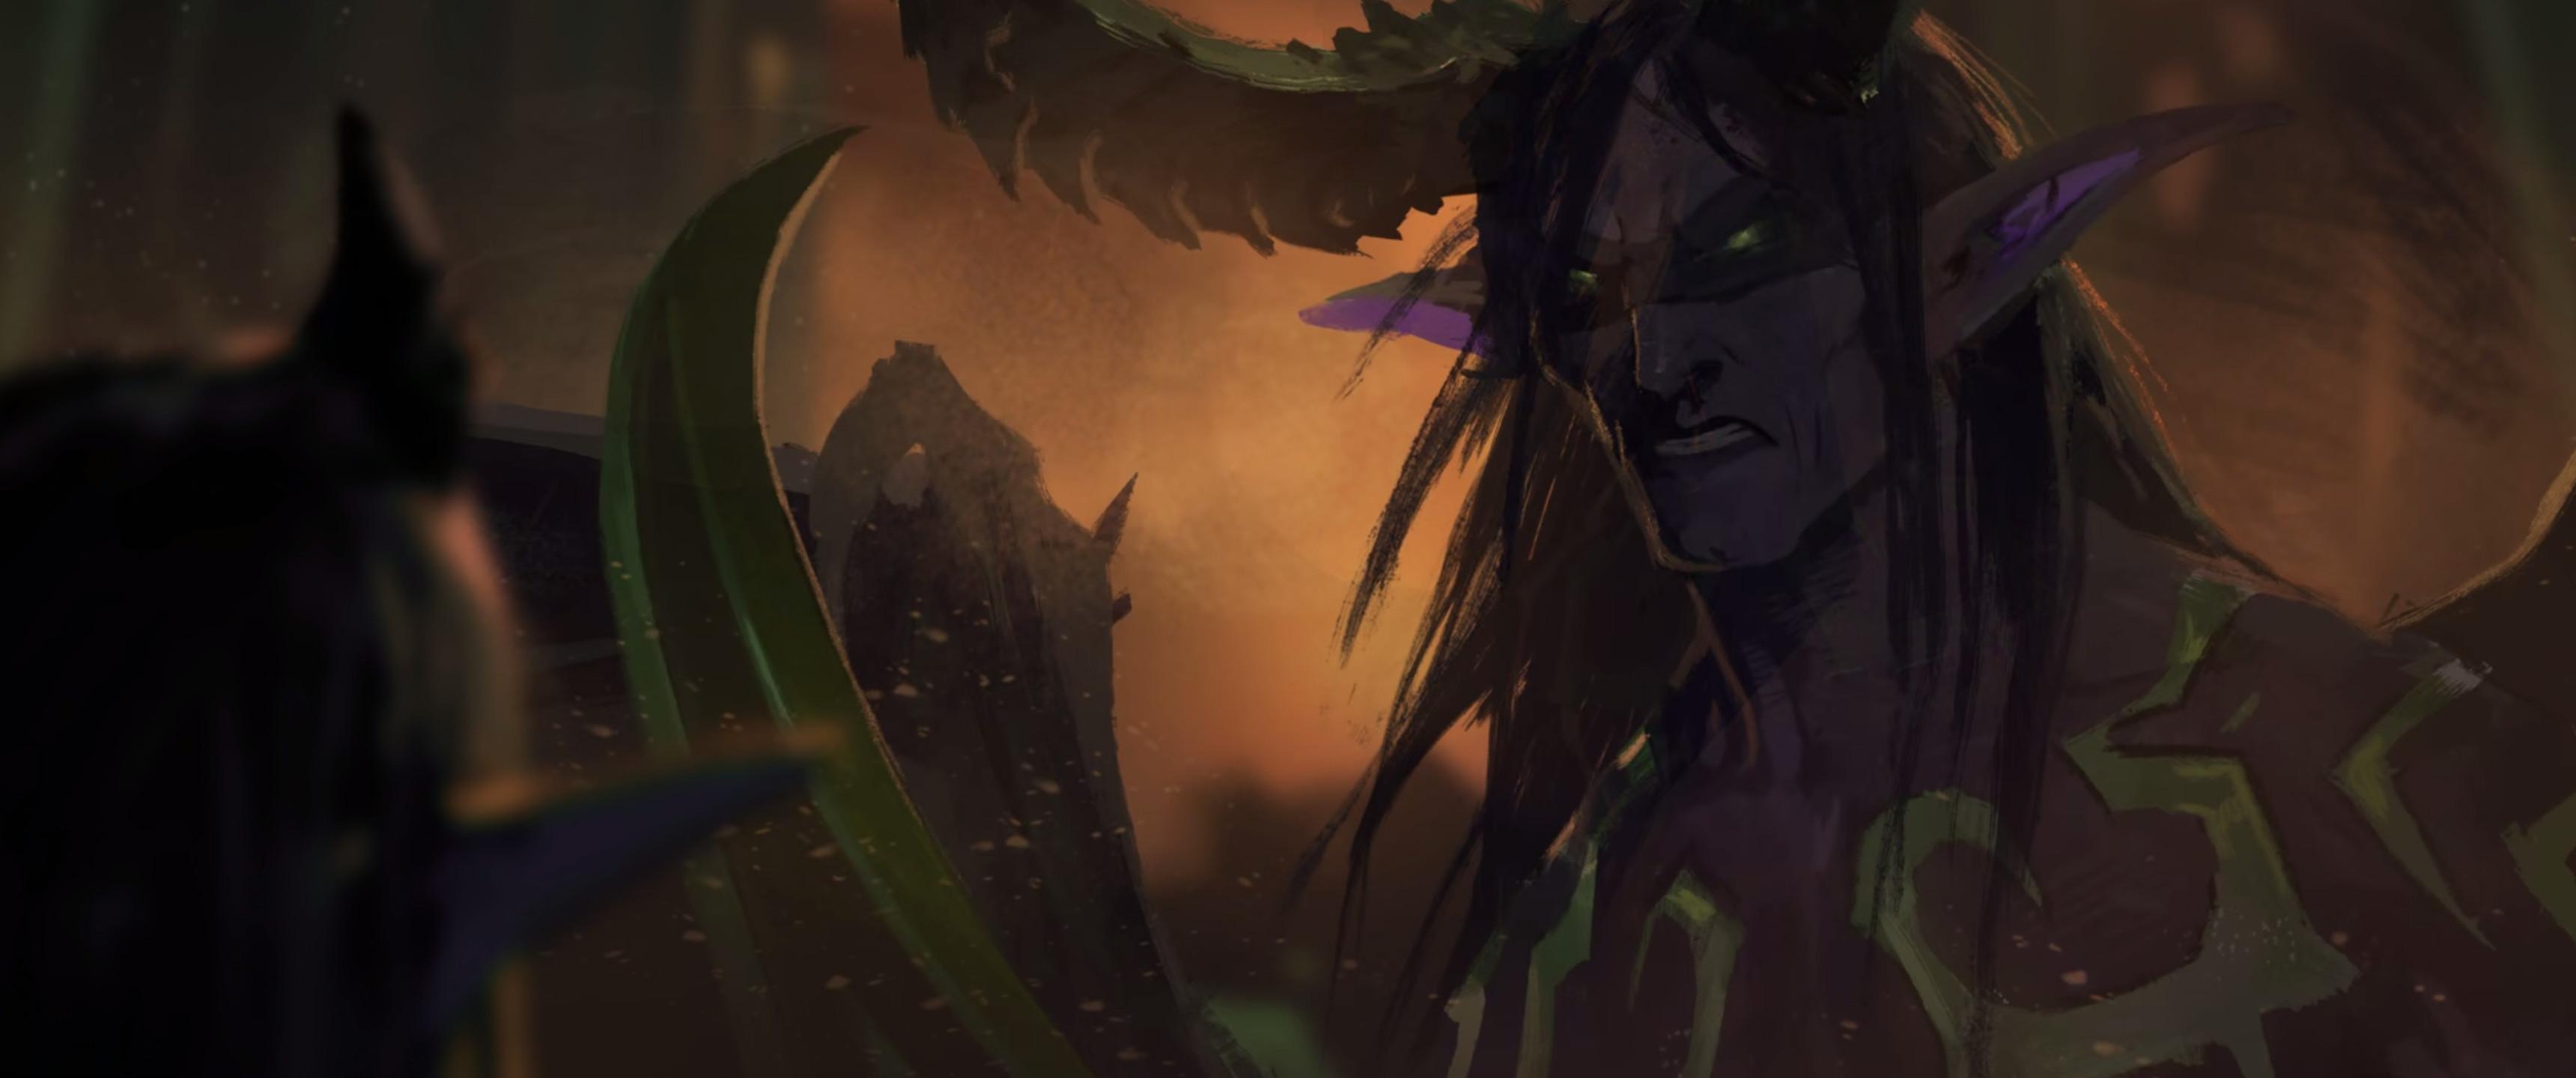 Demon Hunter, World of Warcraft, Blizzard Entertainment, Illidan Stormrage  Wallpapers HD / Desktop and Mobile Backgrounds